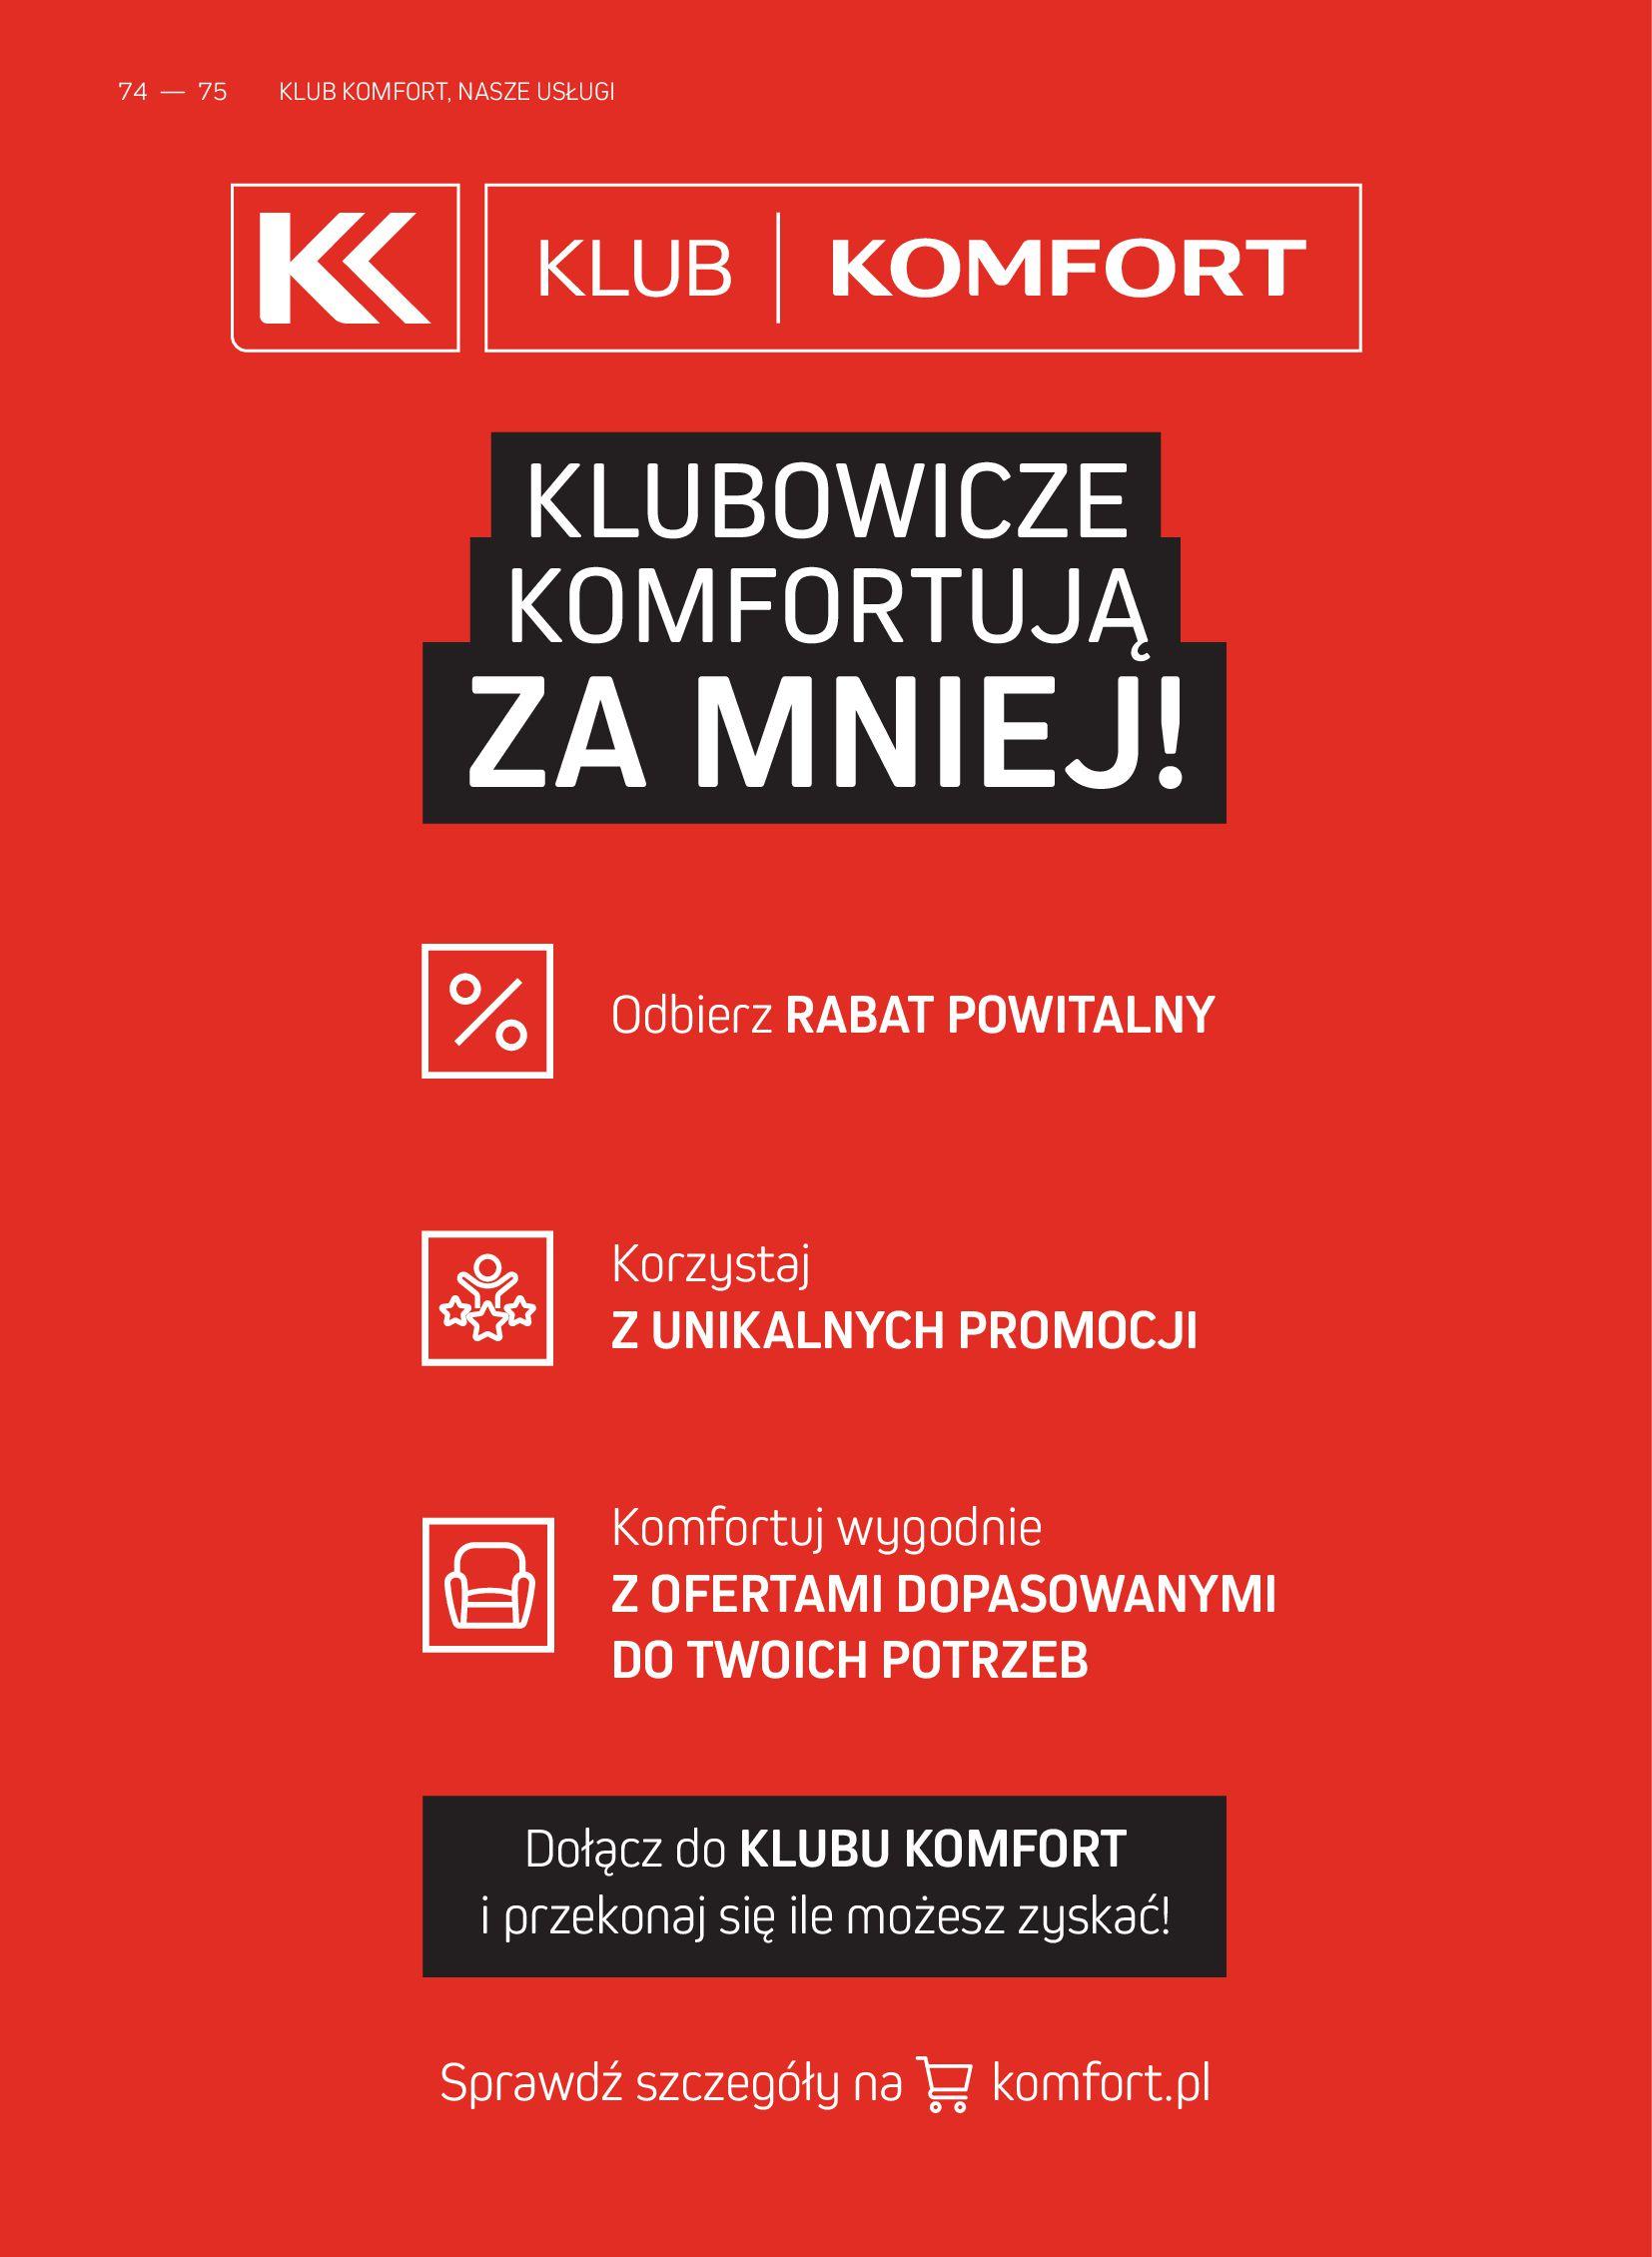 Gazetka Komfort: Gazetka Komfort - Katalog podłogi i drzwi 2021-06-16 page-74